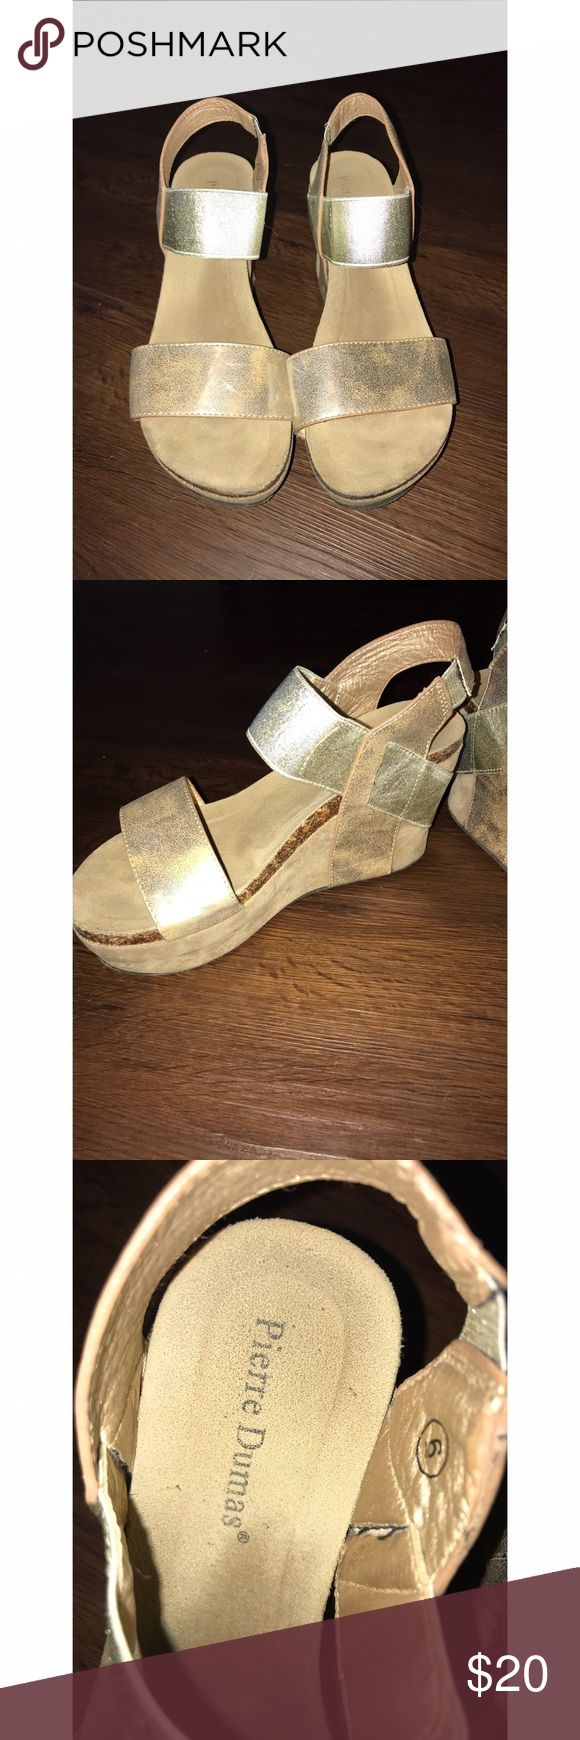 Pierre Dumas Wedges Pierre Dumas Gold Wedges! Size 6 - Just don't wear them enough --- Open to offers! :-) Pierre Dumas Shoes Wedges